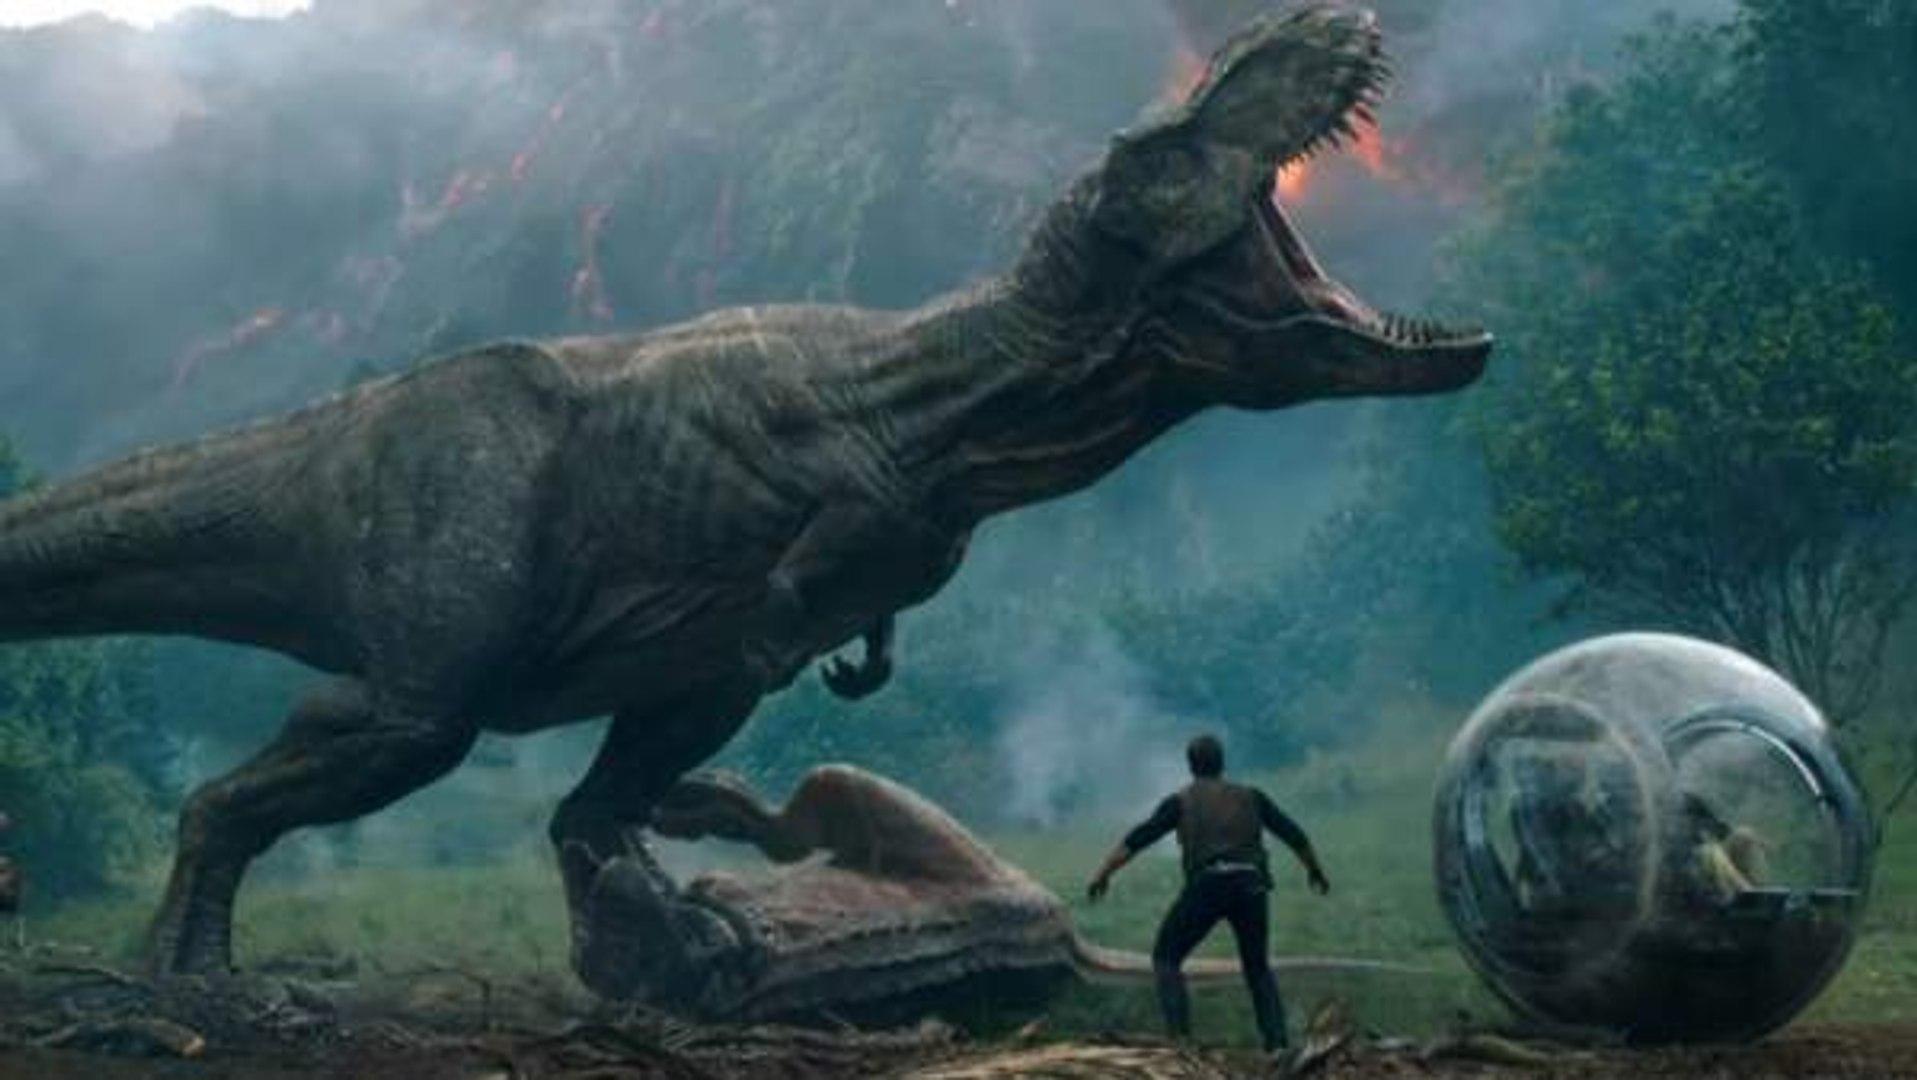 Jurassic World El Reino Caído Trailer Español Hd Vídeo Dailymotion